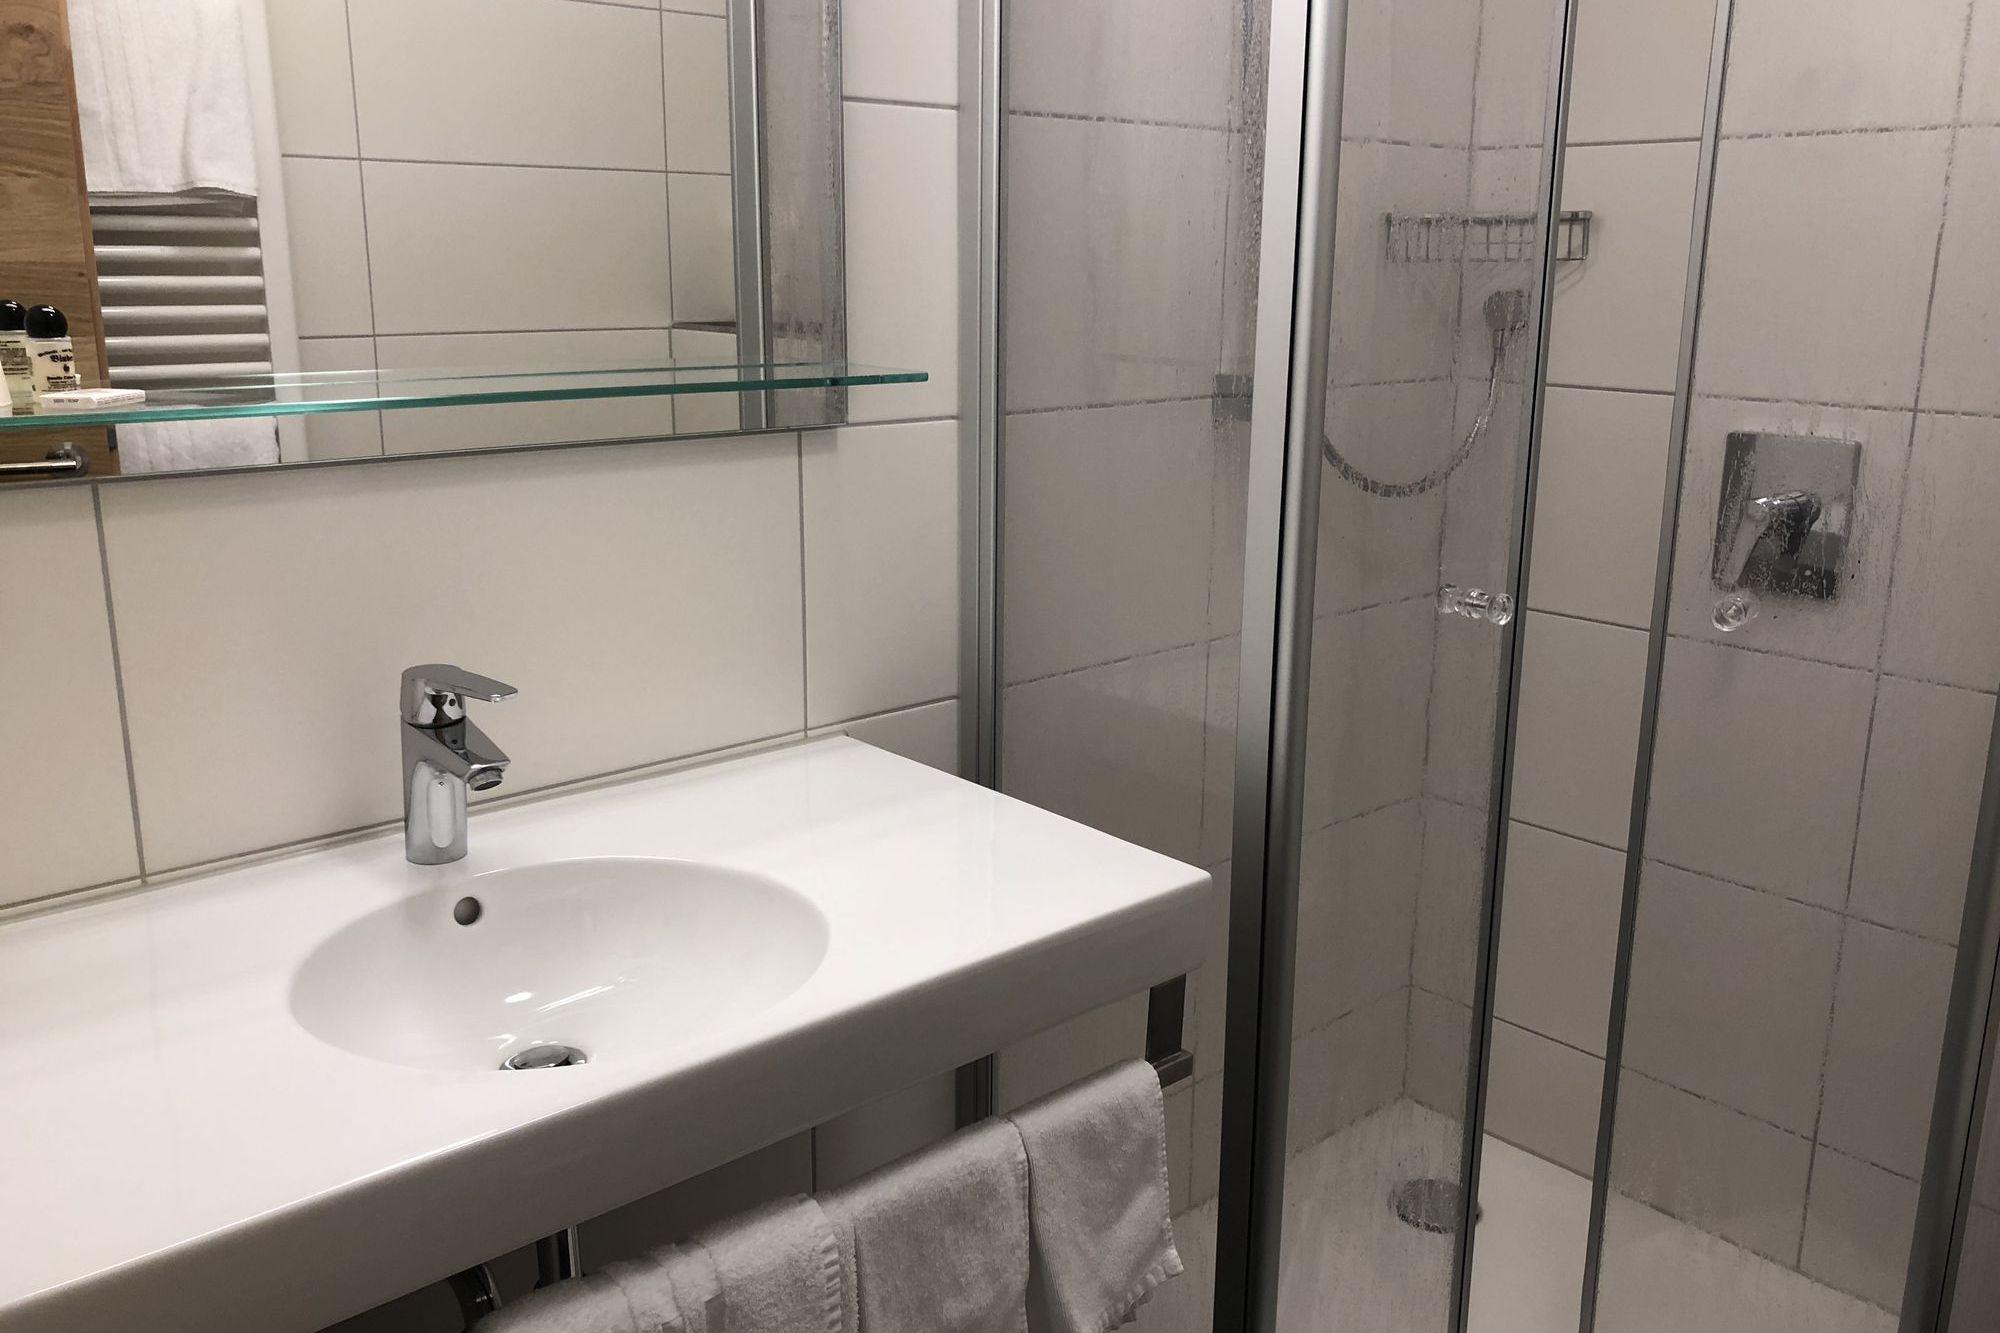 https://www.hotelbinder.de/wp-content/uploads/einzelzimmer2_6.jpg